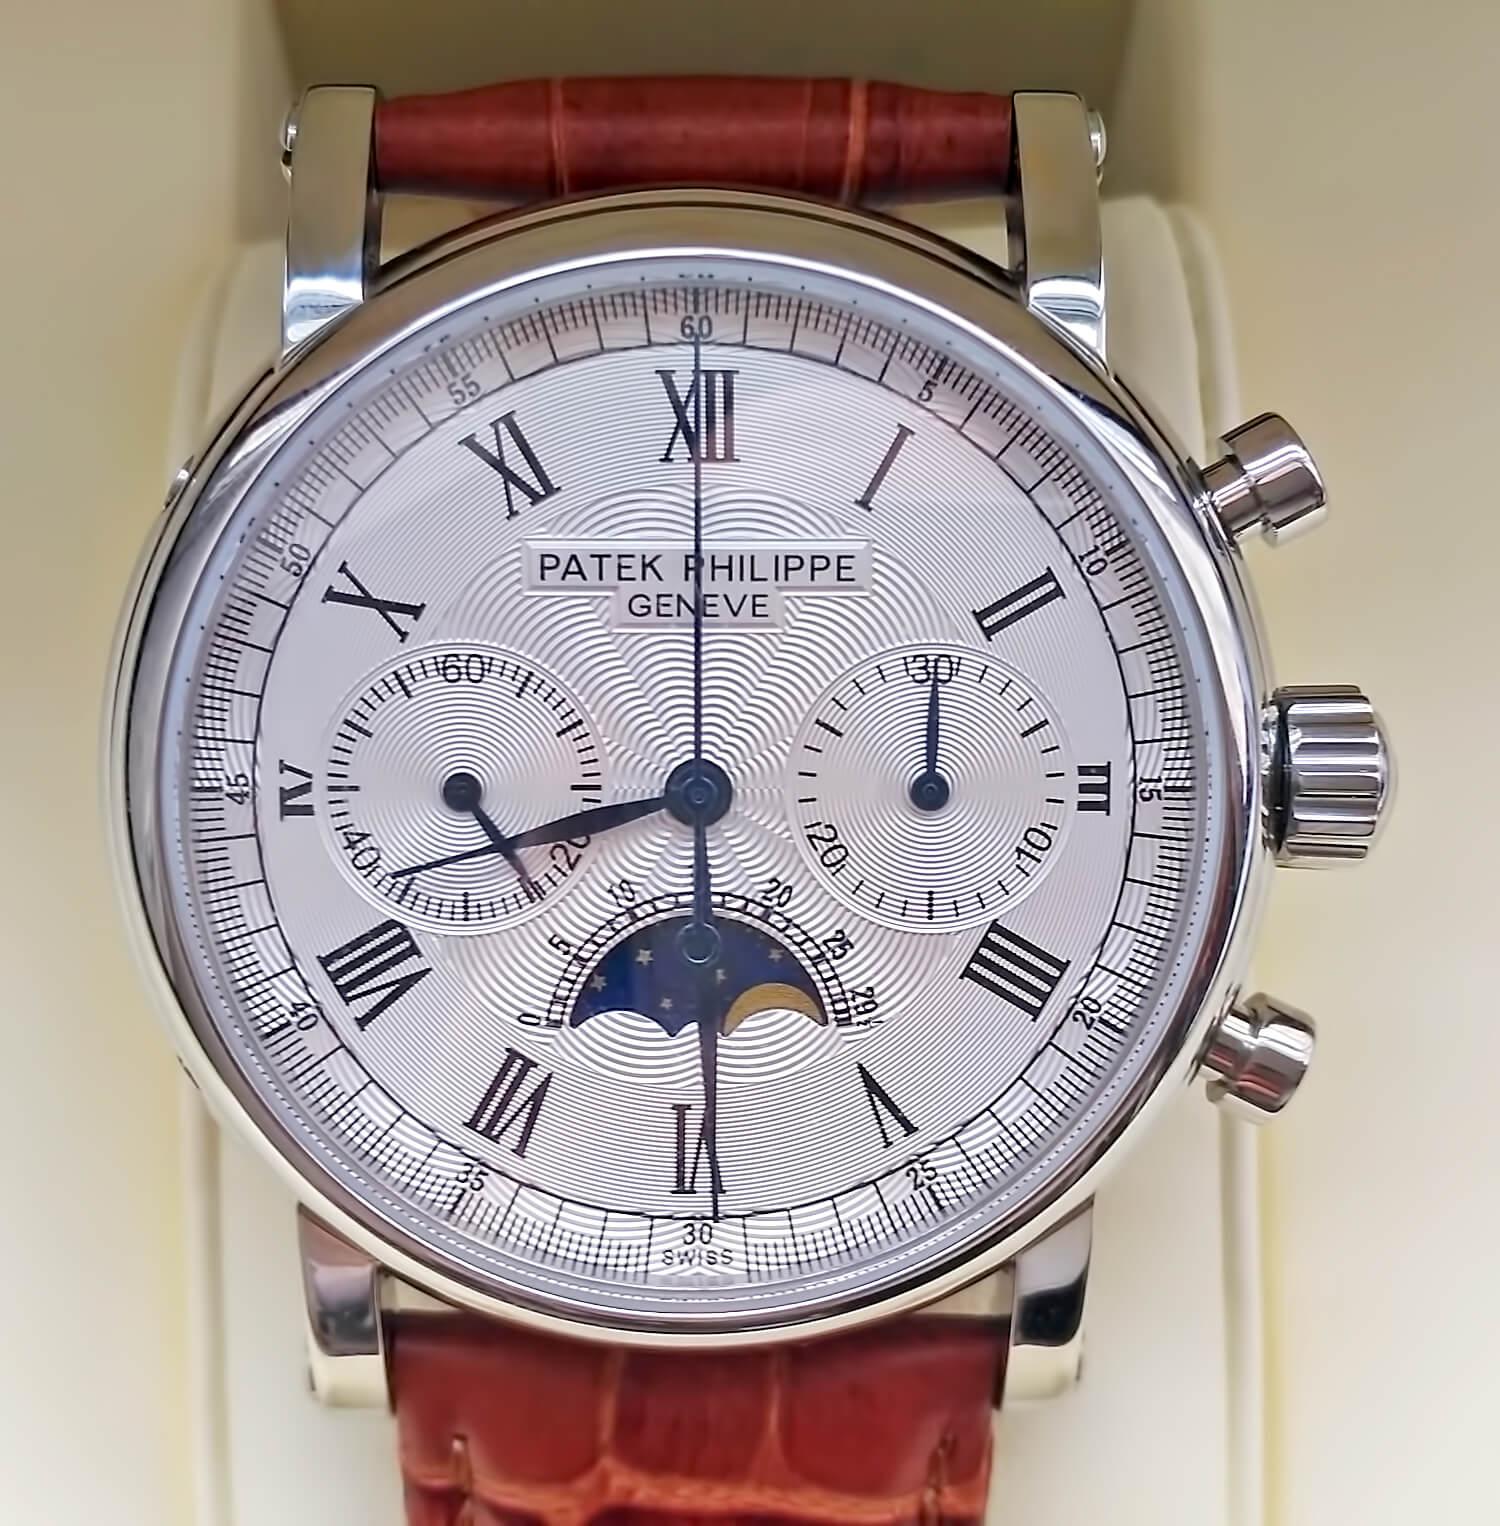 Циферблат часов Patek Philippe GRAND COMPLICATIONS оснащен субциферблатами и индикатором лунных фаз